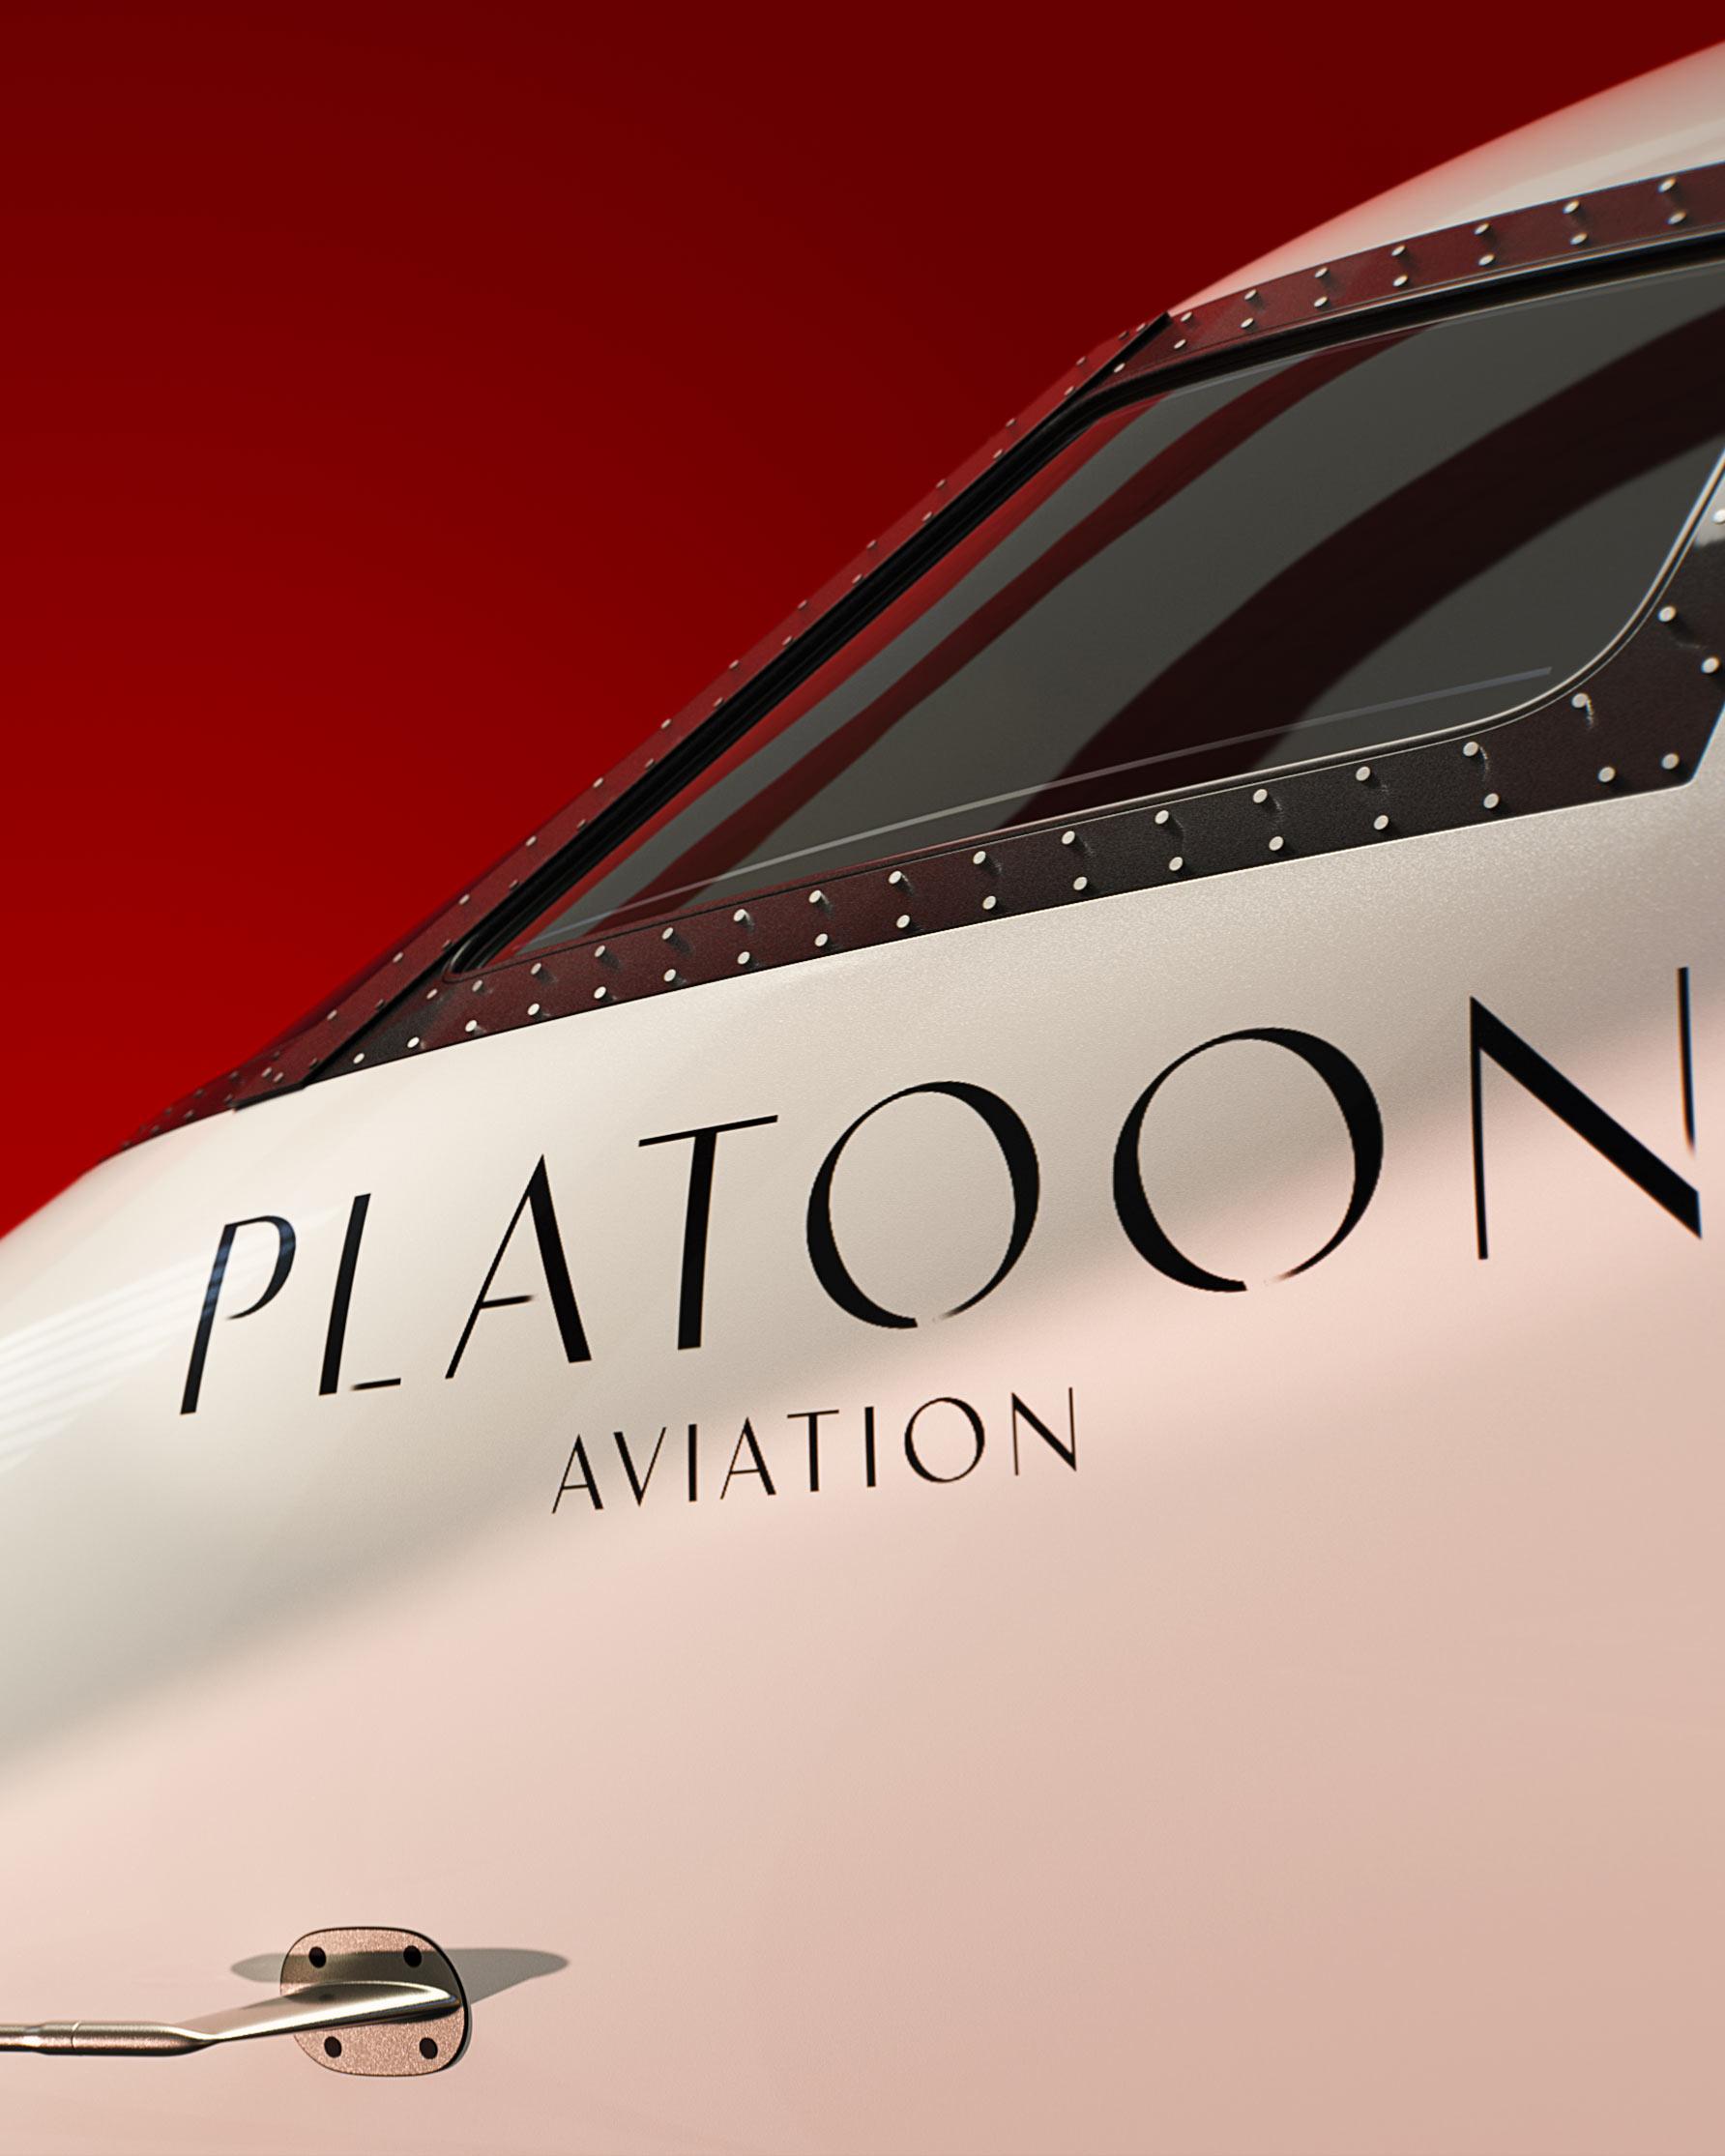 Platoon - Plane Image